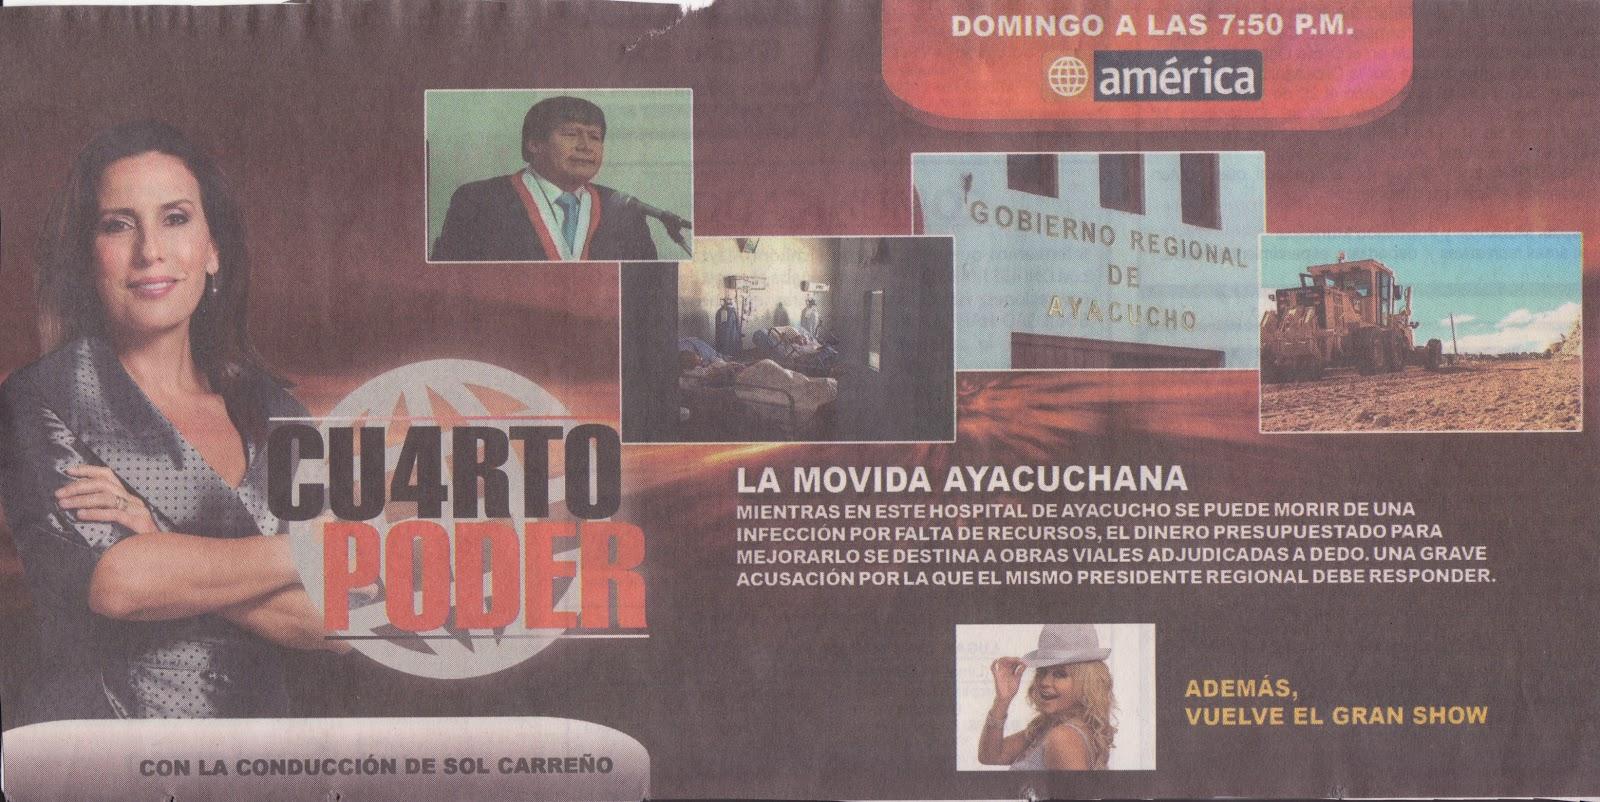 Decocounpoco2 la movida ayacuchana denuncia de cuarto for Cuarto poder america tv